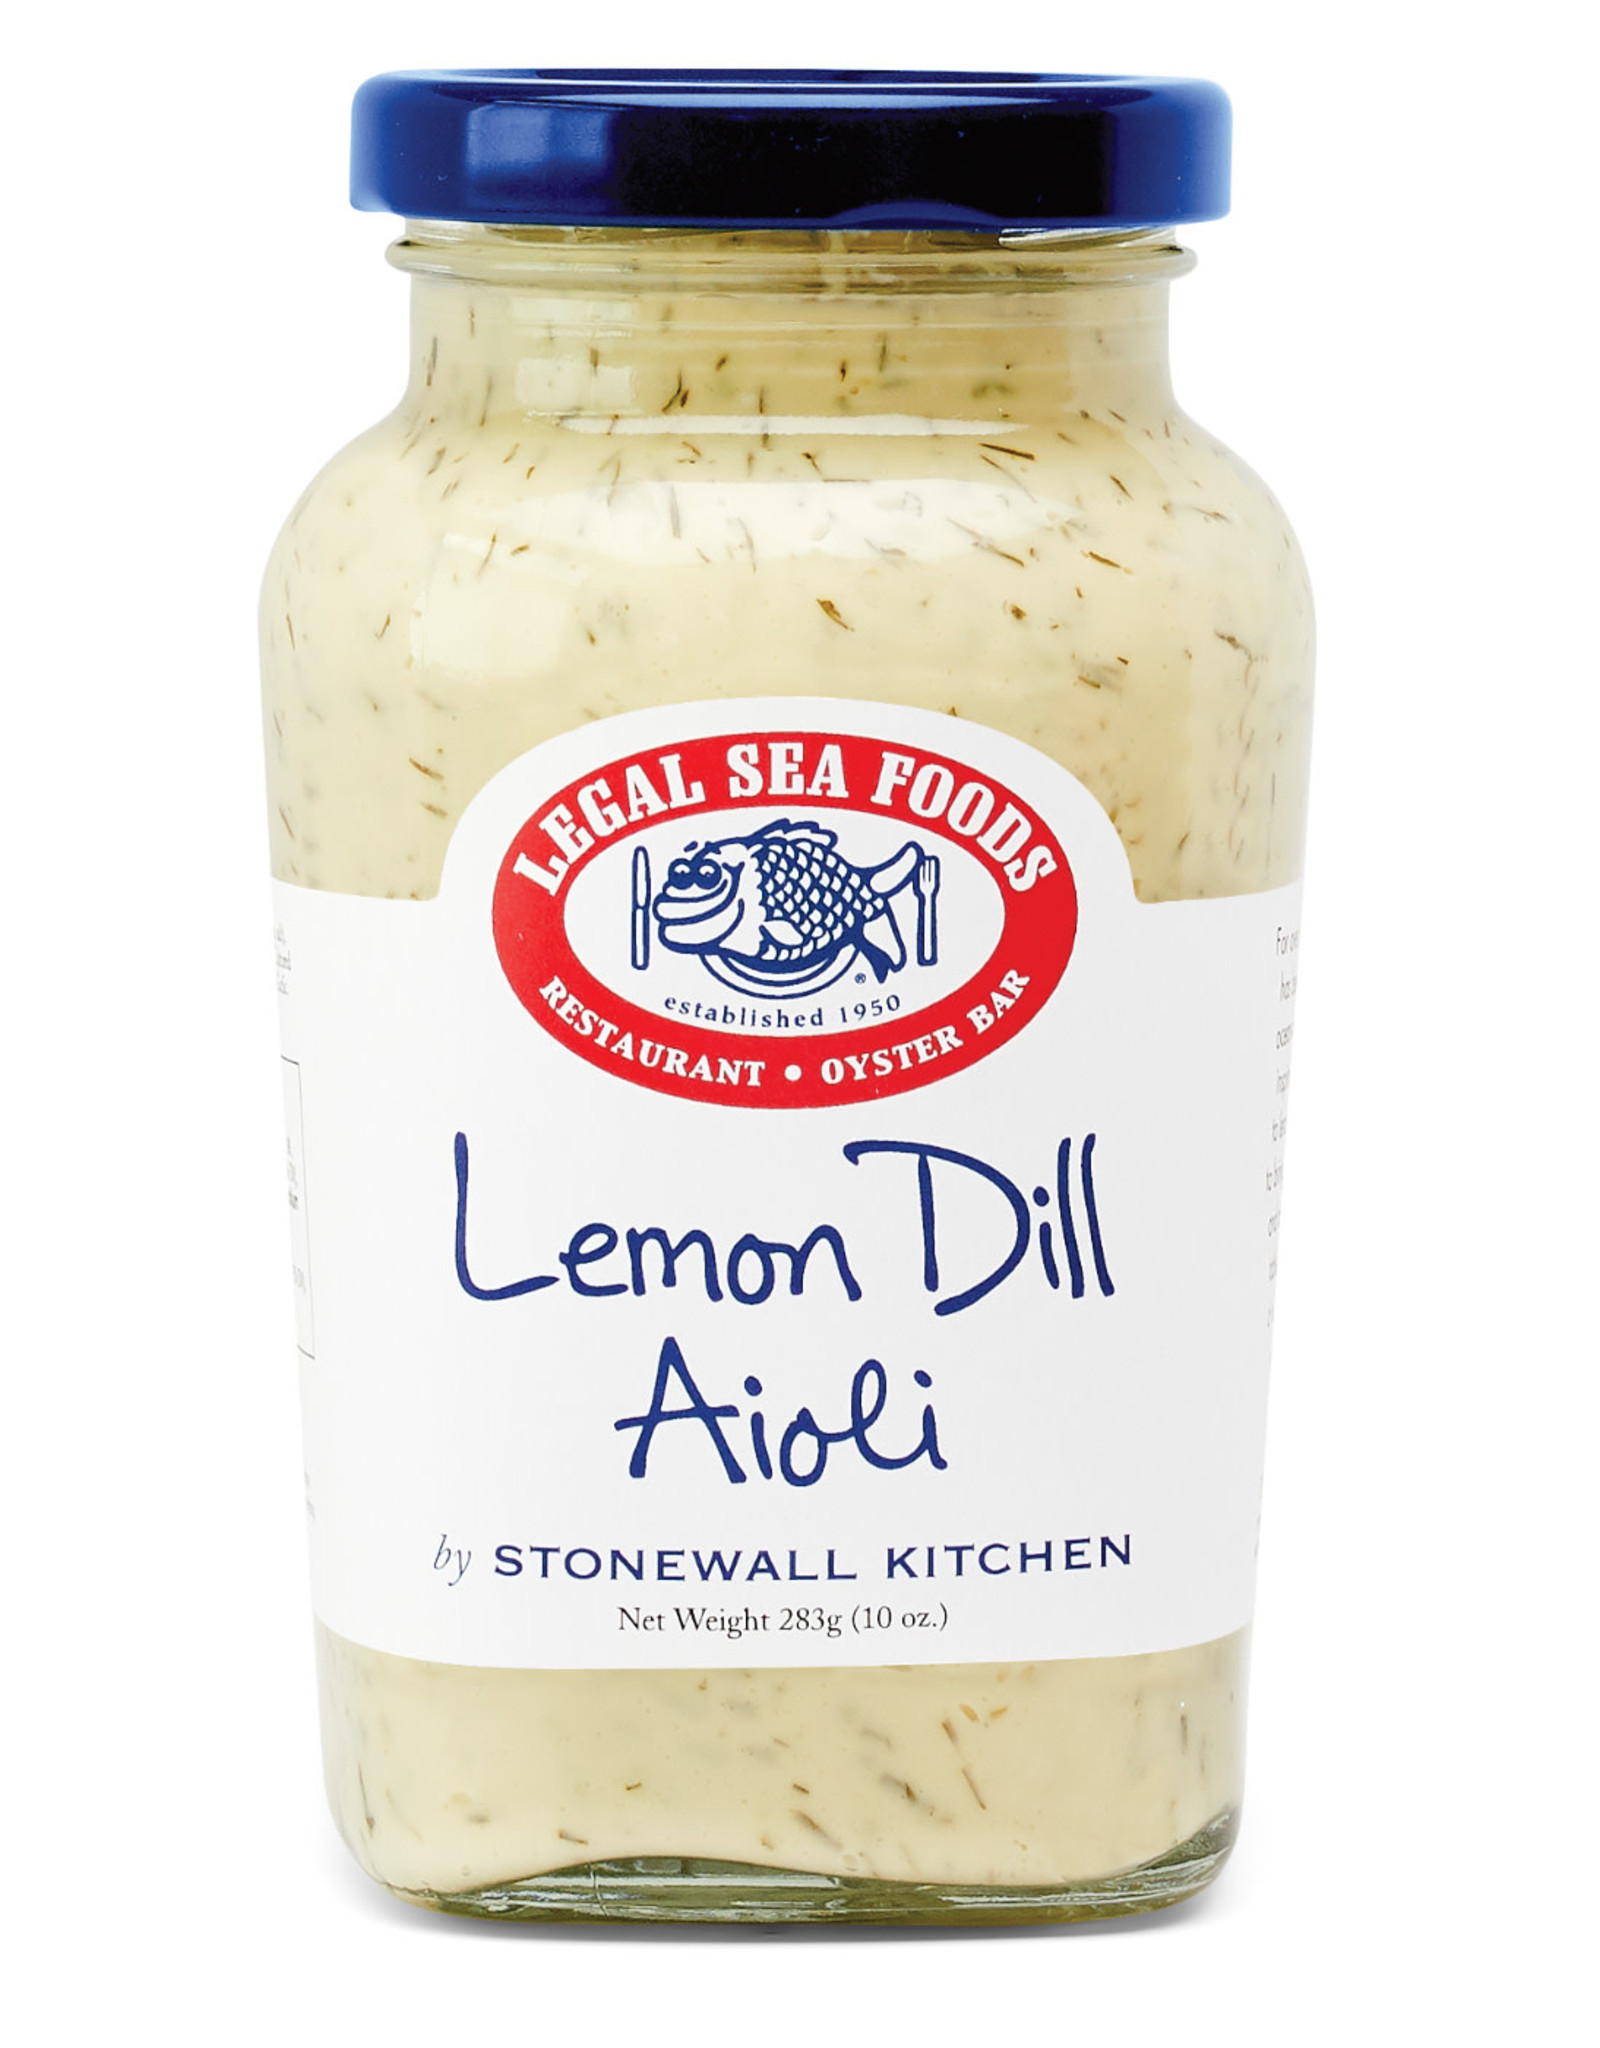 Stonewall Kitchen Lemon Dill Aioli